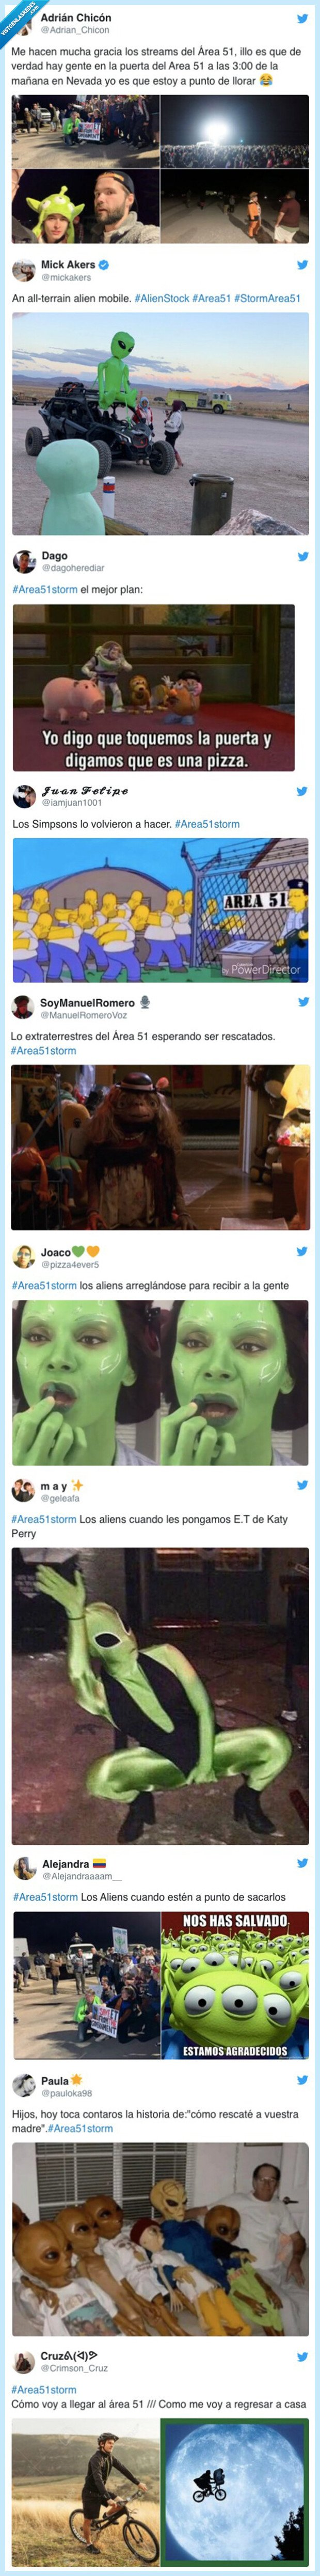 aliens,area51,memes